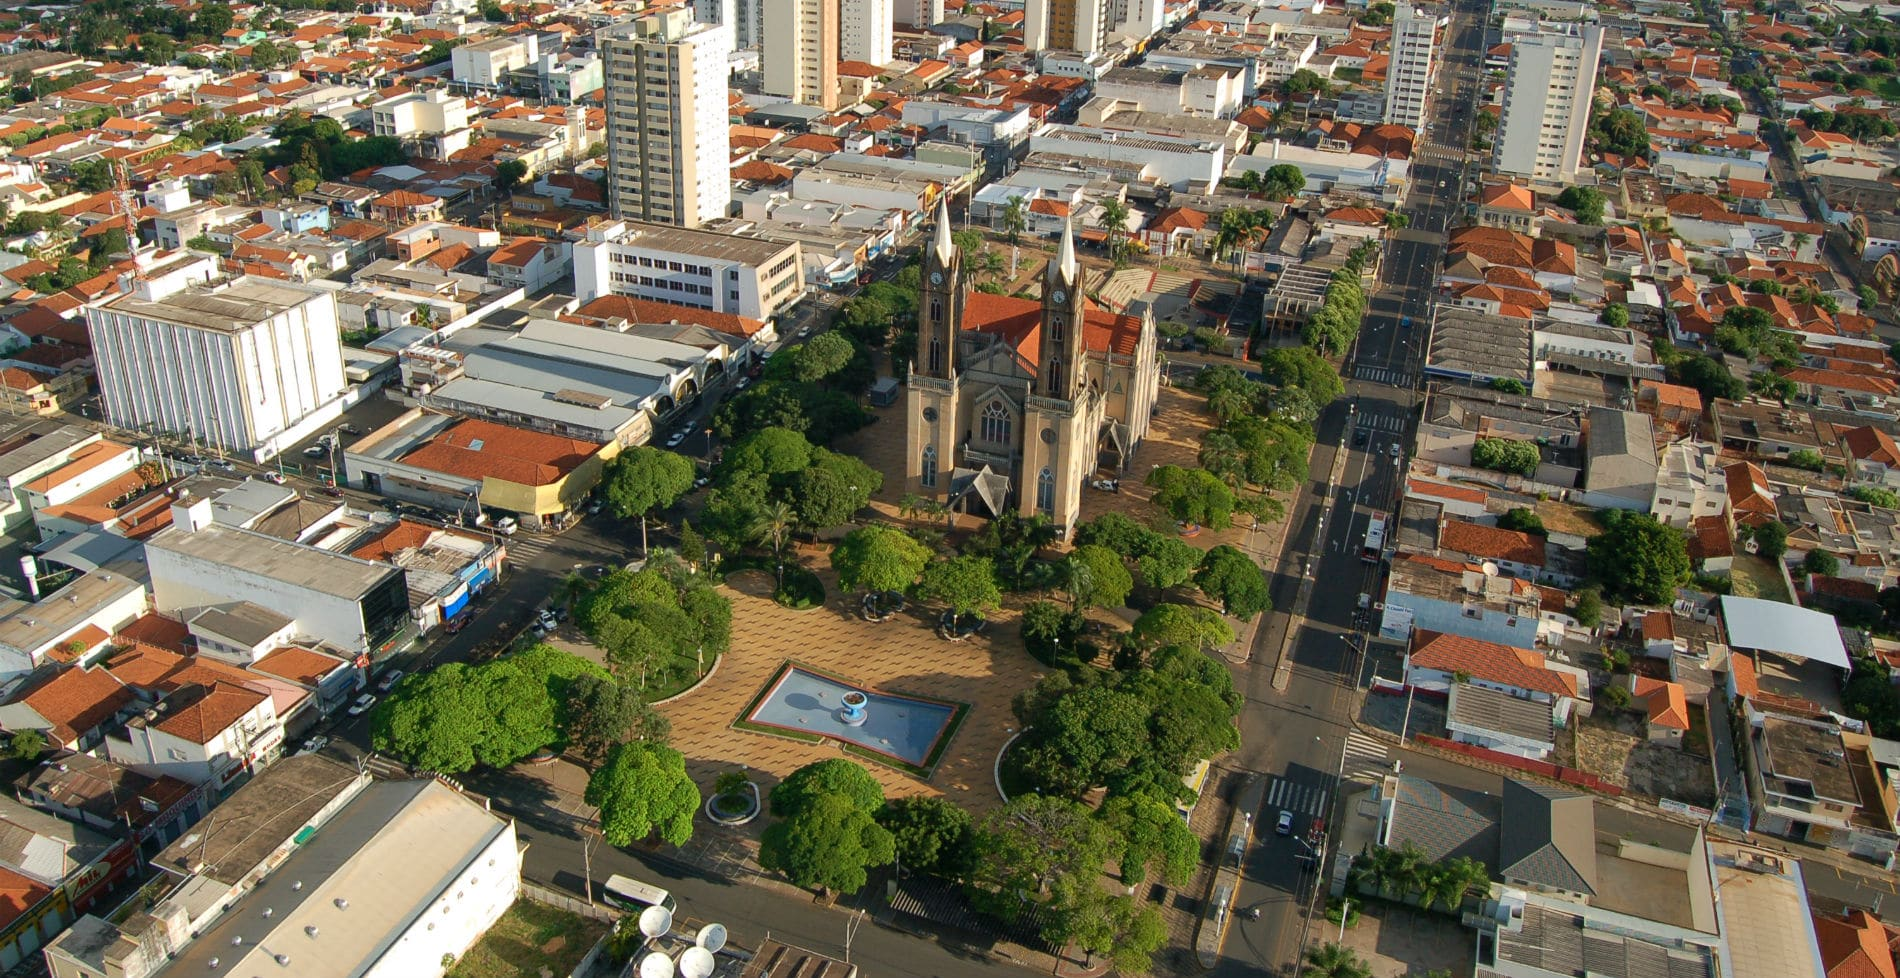 Votuporanga São Paulo fonte: proddigital.com.br